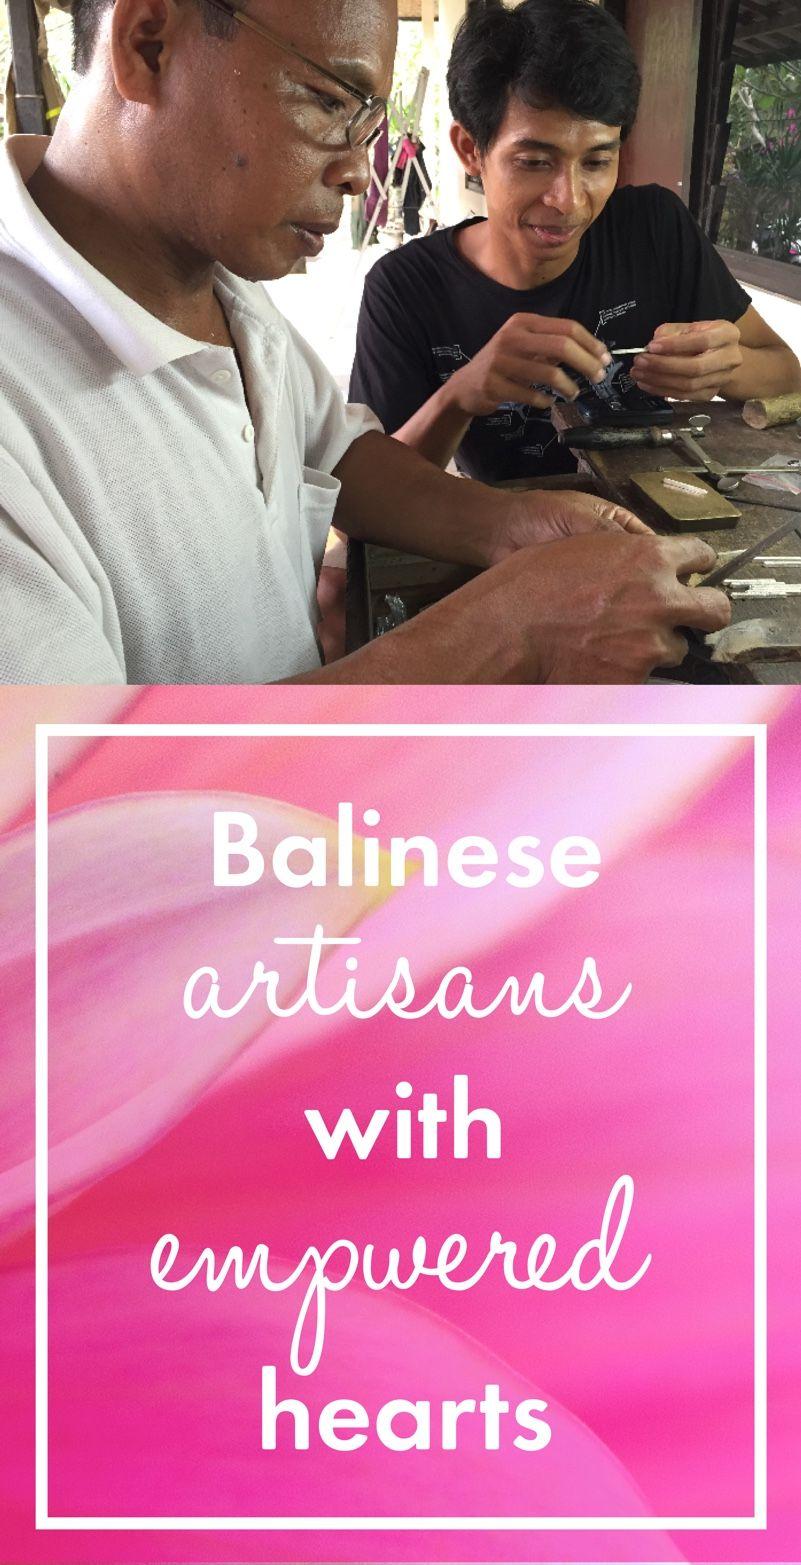 Balinese-artisans-mobile.-compressor